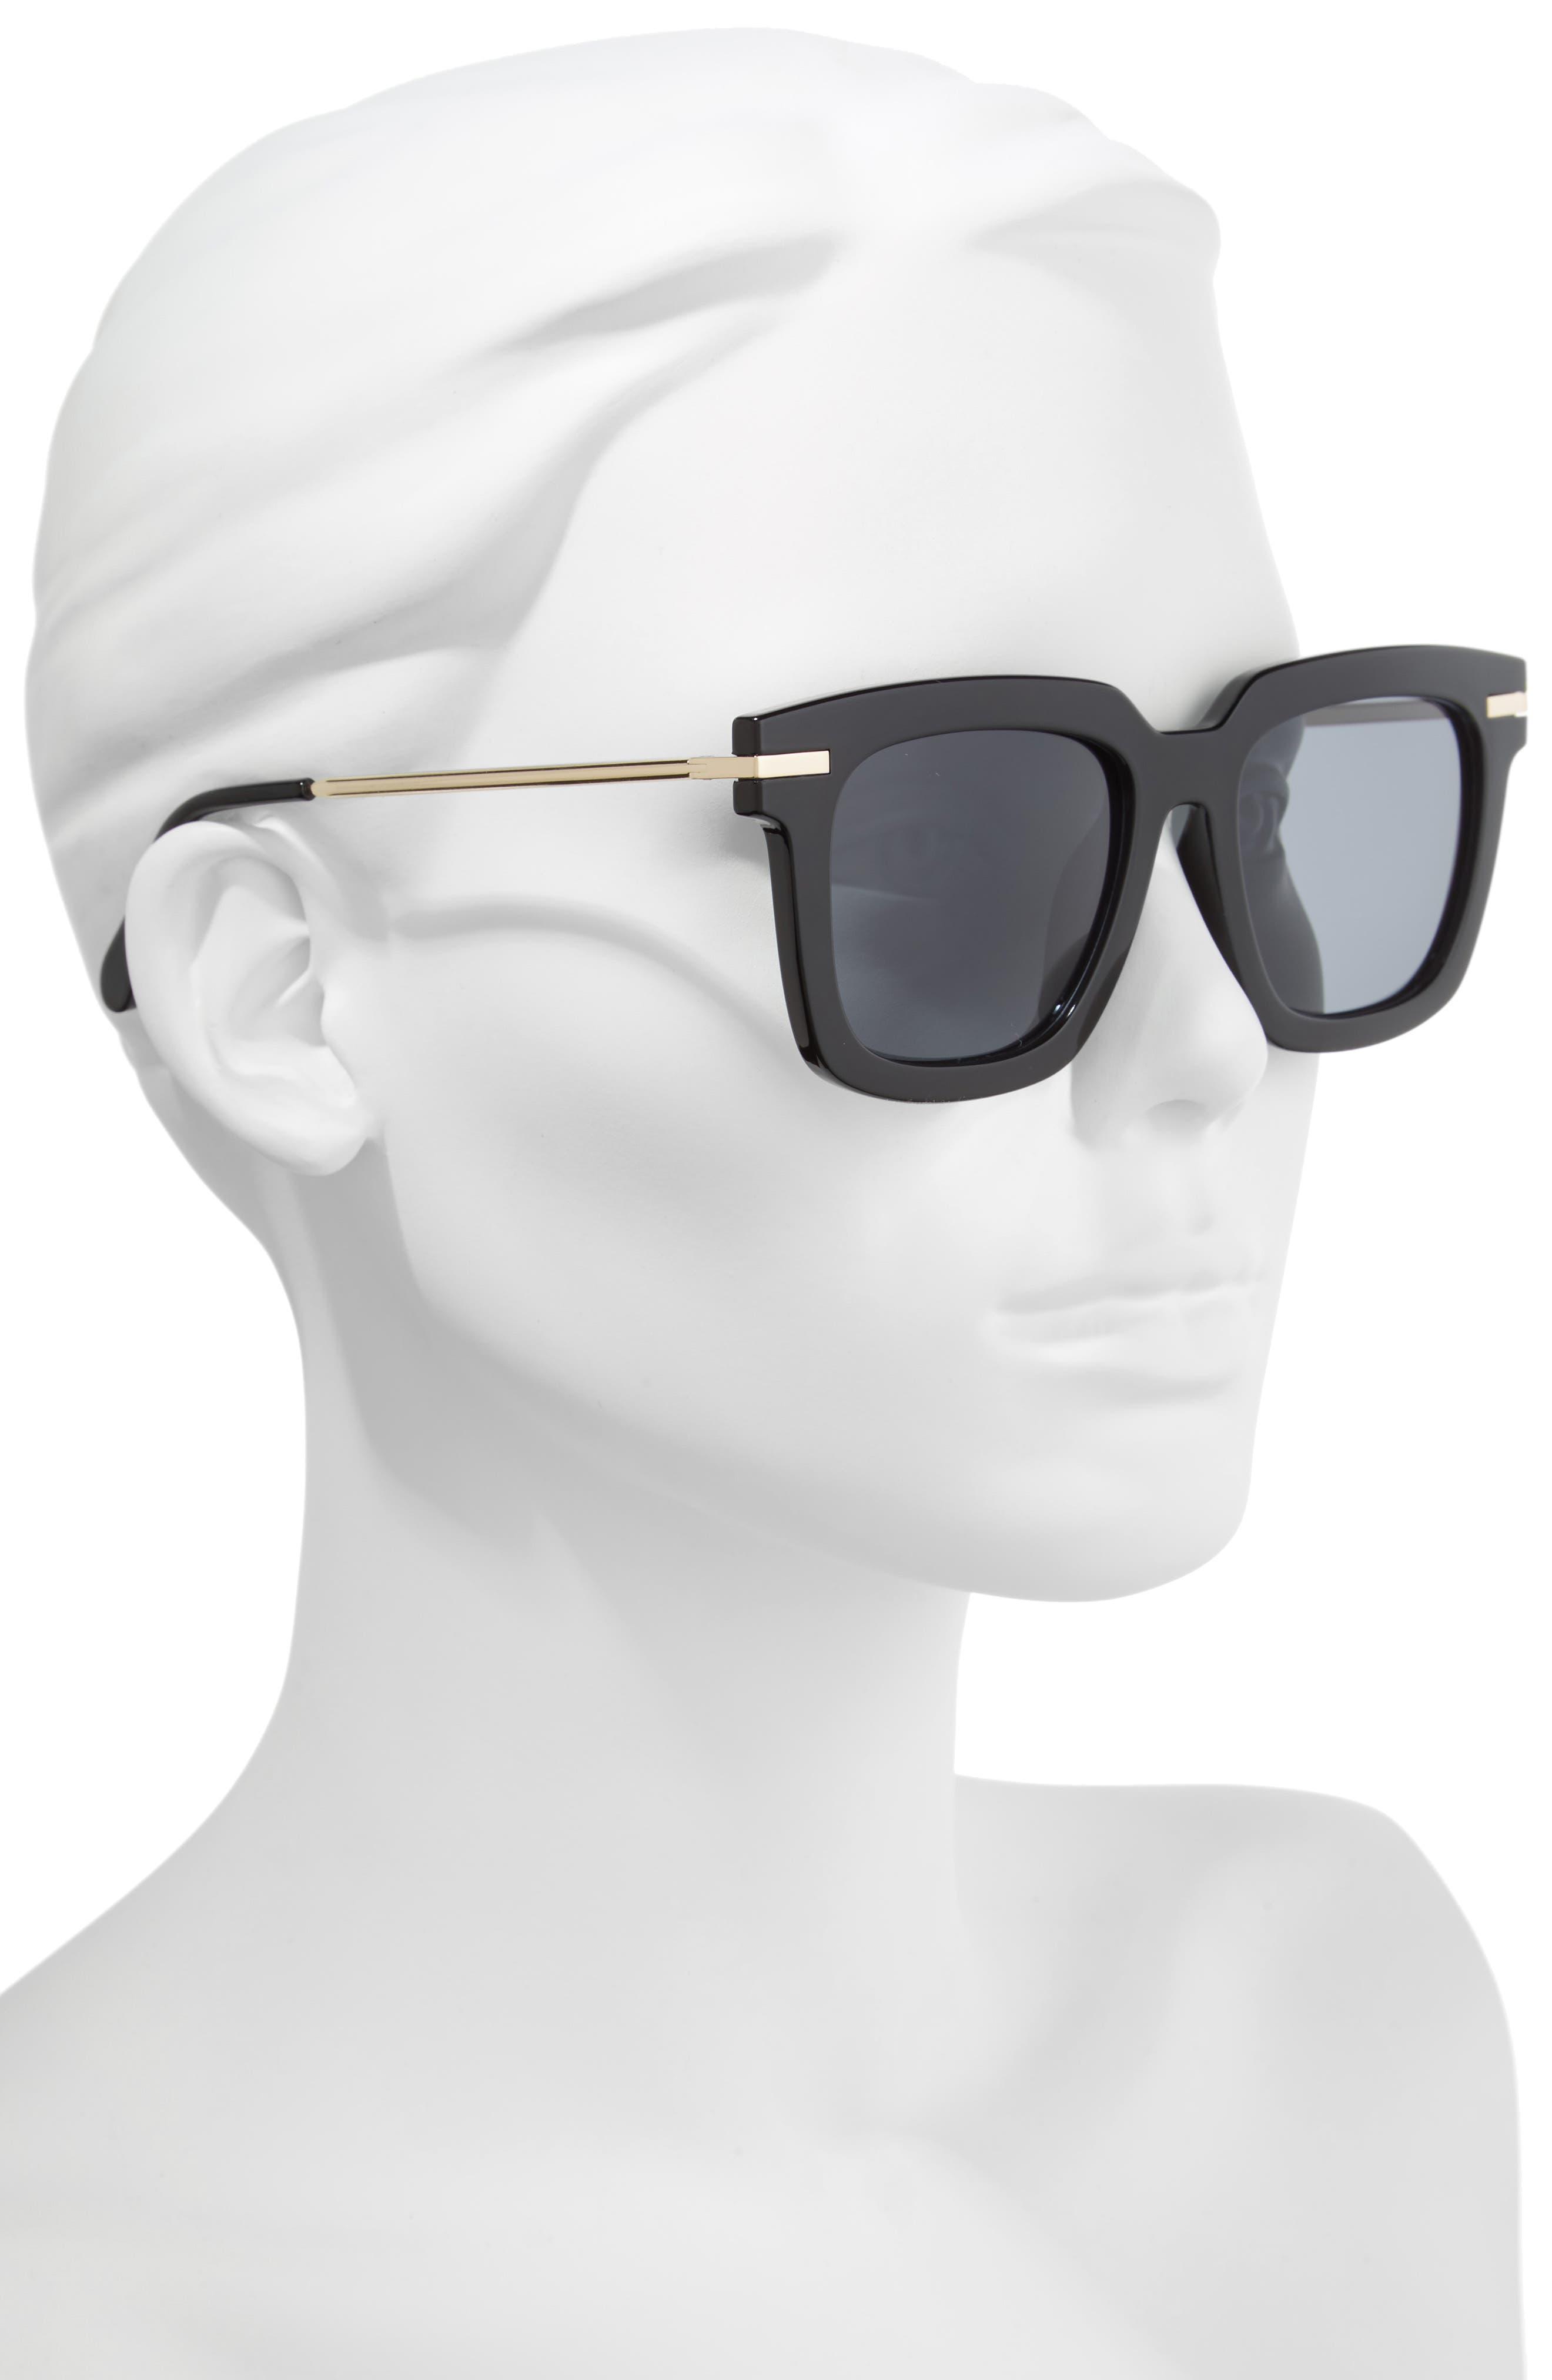 Laguna 51mm Polarized Sunglasses,                             Alternate thumbnail 2, color,                             001